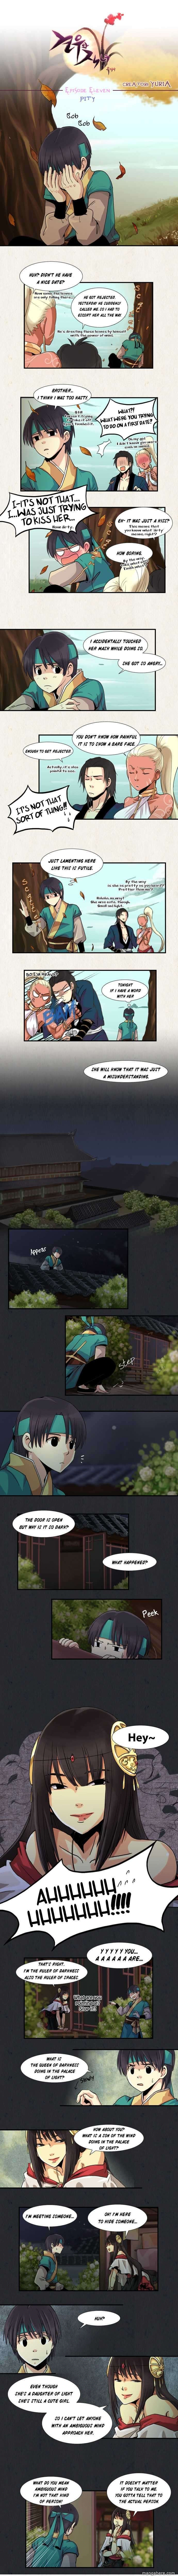 Gyon Woo Jik Nyu 11 Page 2